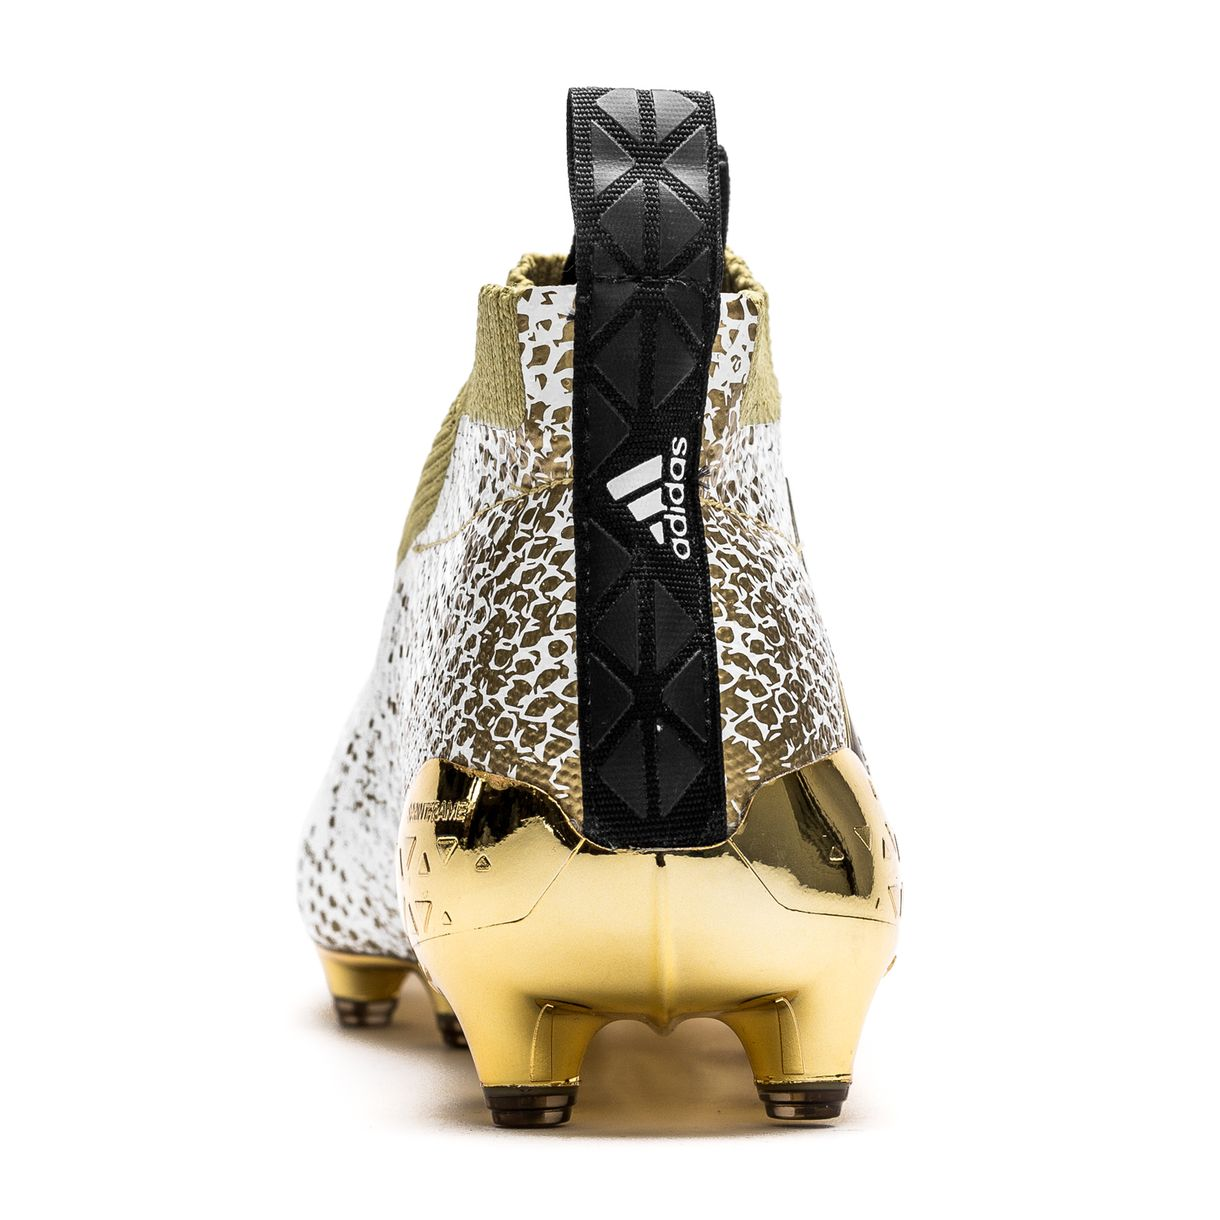 54cab228 ... Click to enlarge image  adidas_ace_16_purecontrol_fg_ag_stellar_pack_white_core_black_gold_metallic_b.jpg  ...